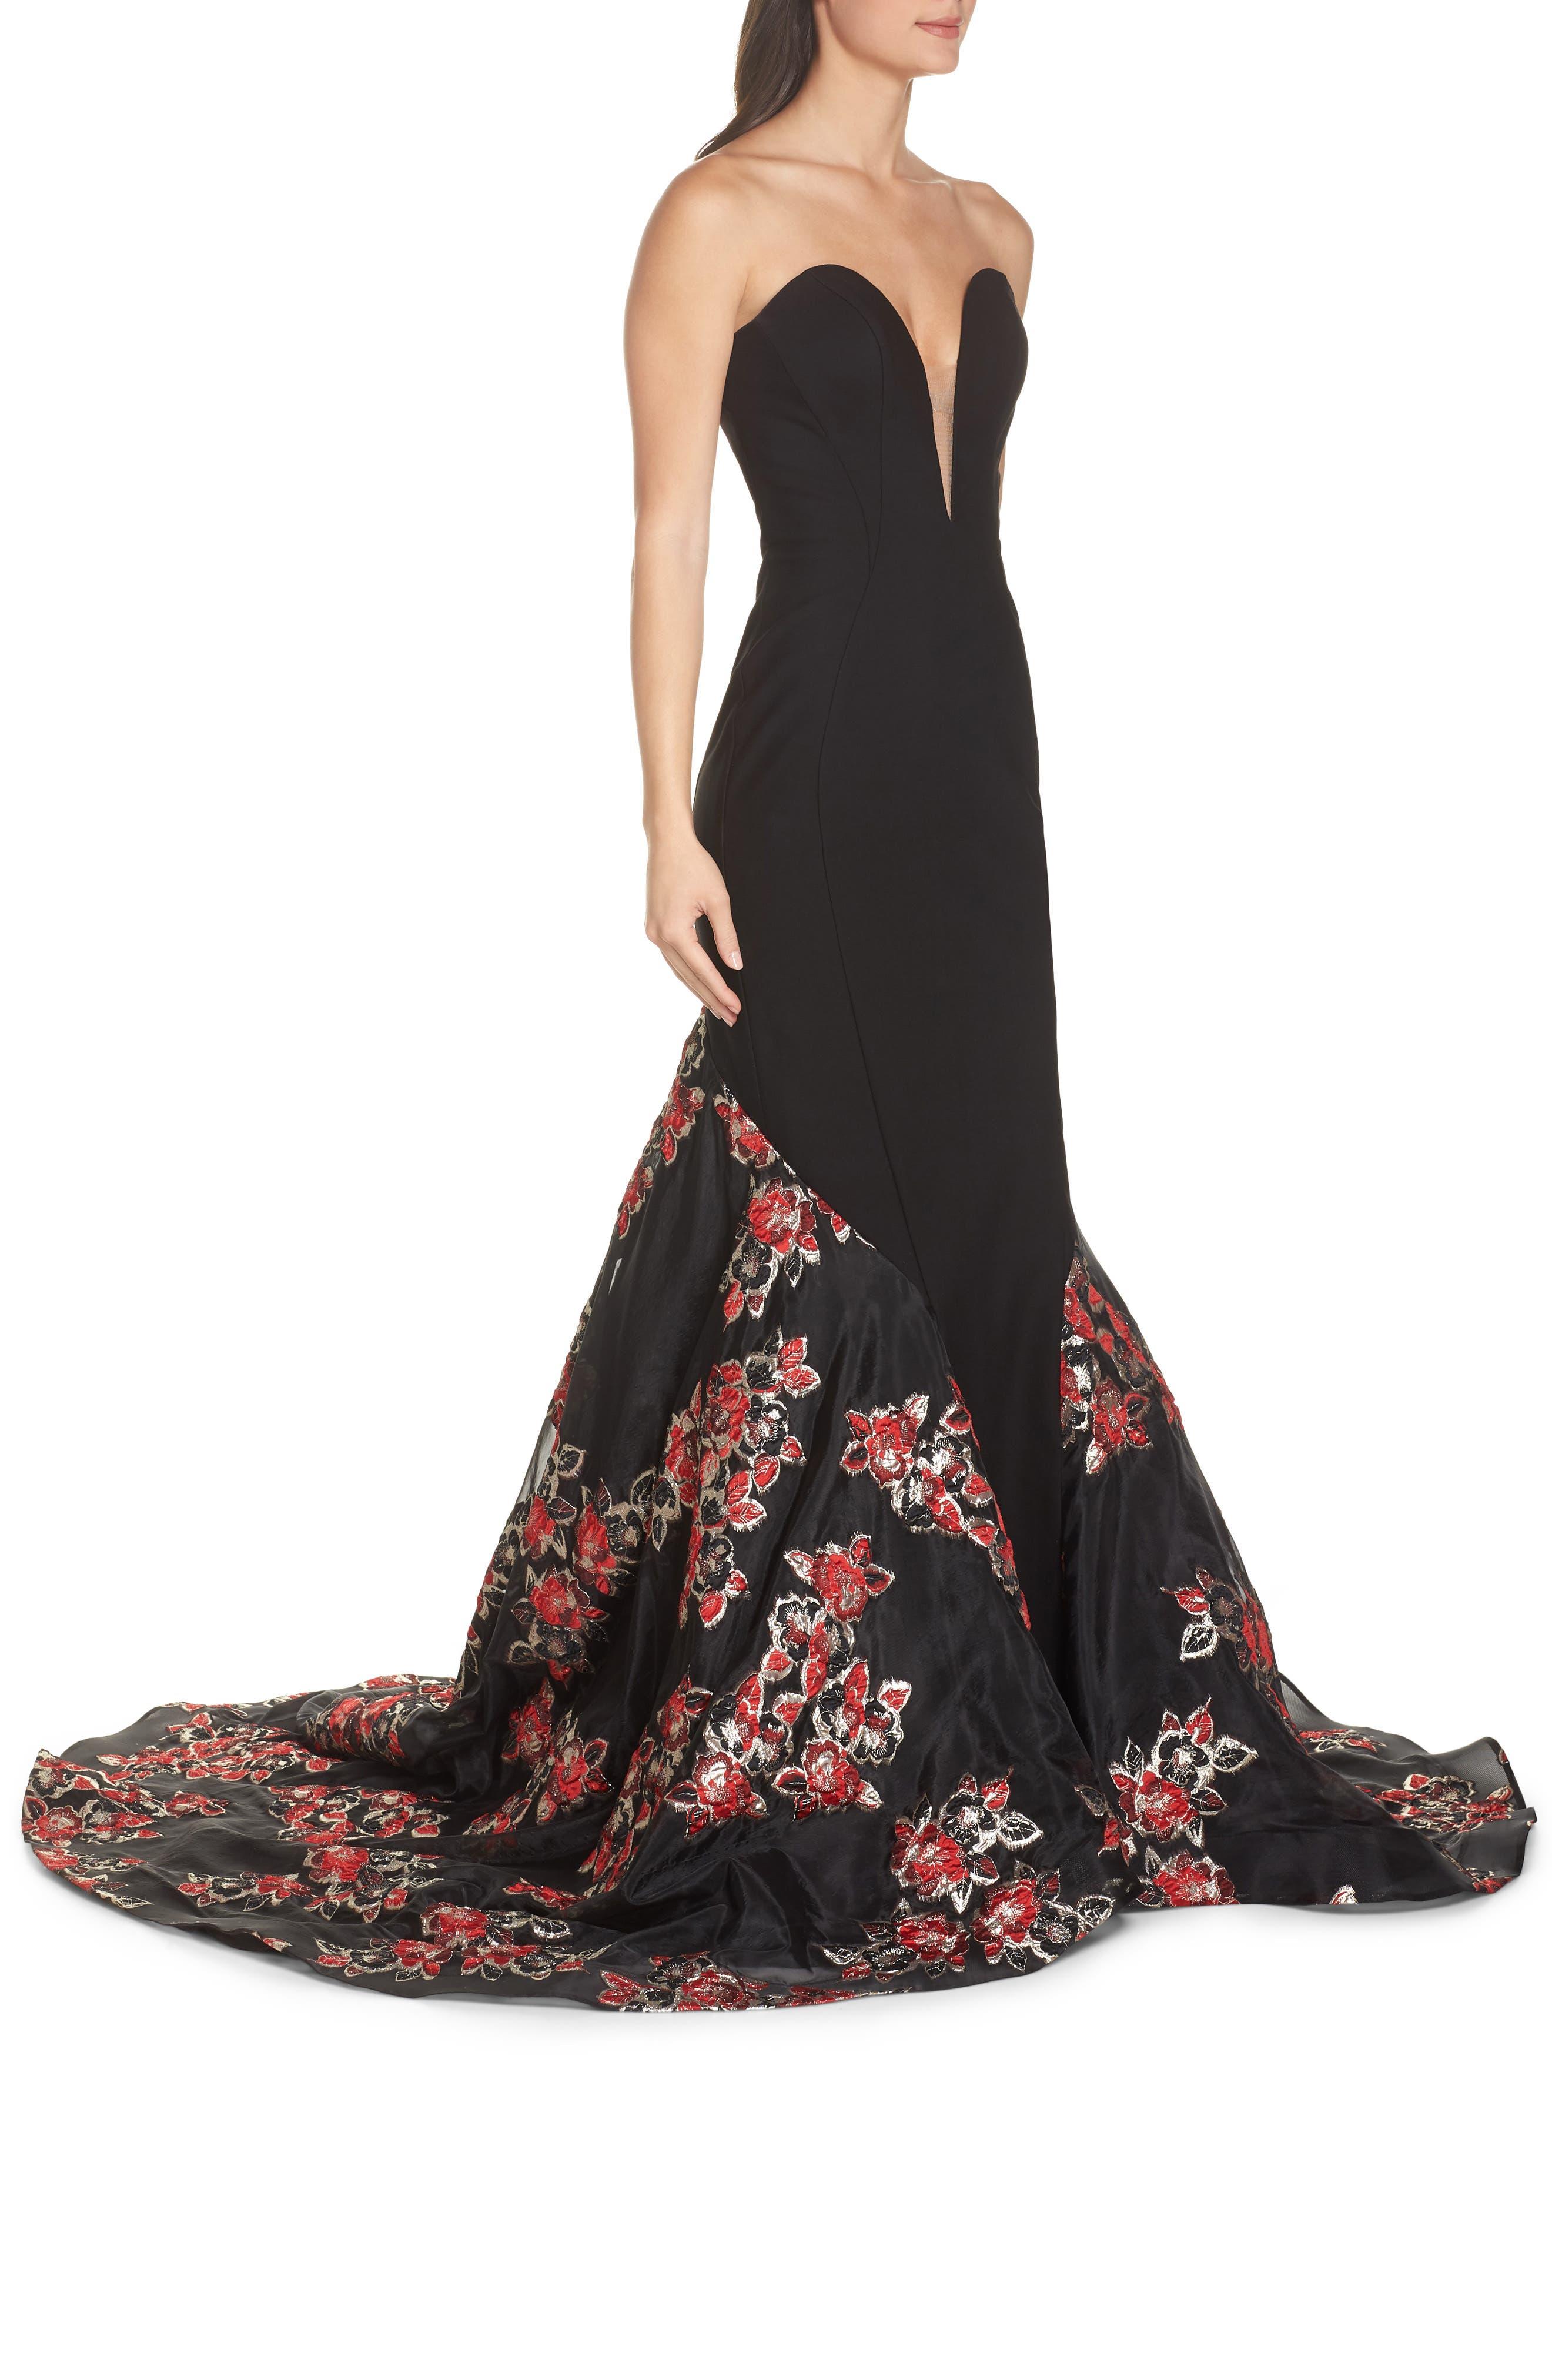 MAC DUGGAL, Plunge Floral Jacquard Mermaid Gown, Alternate thumbnail 3, color, BLACK